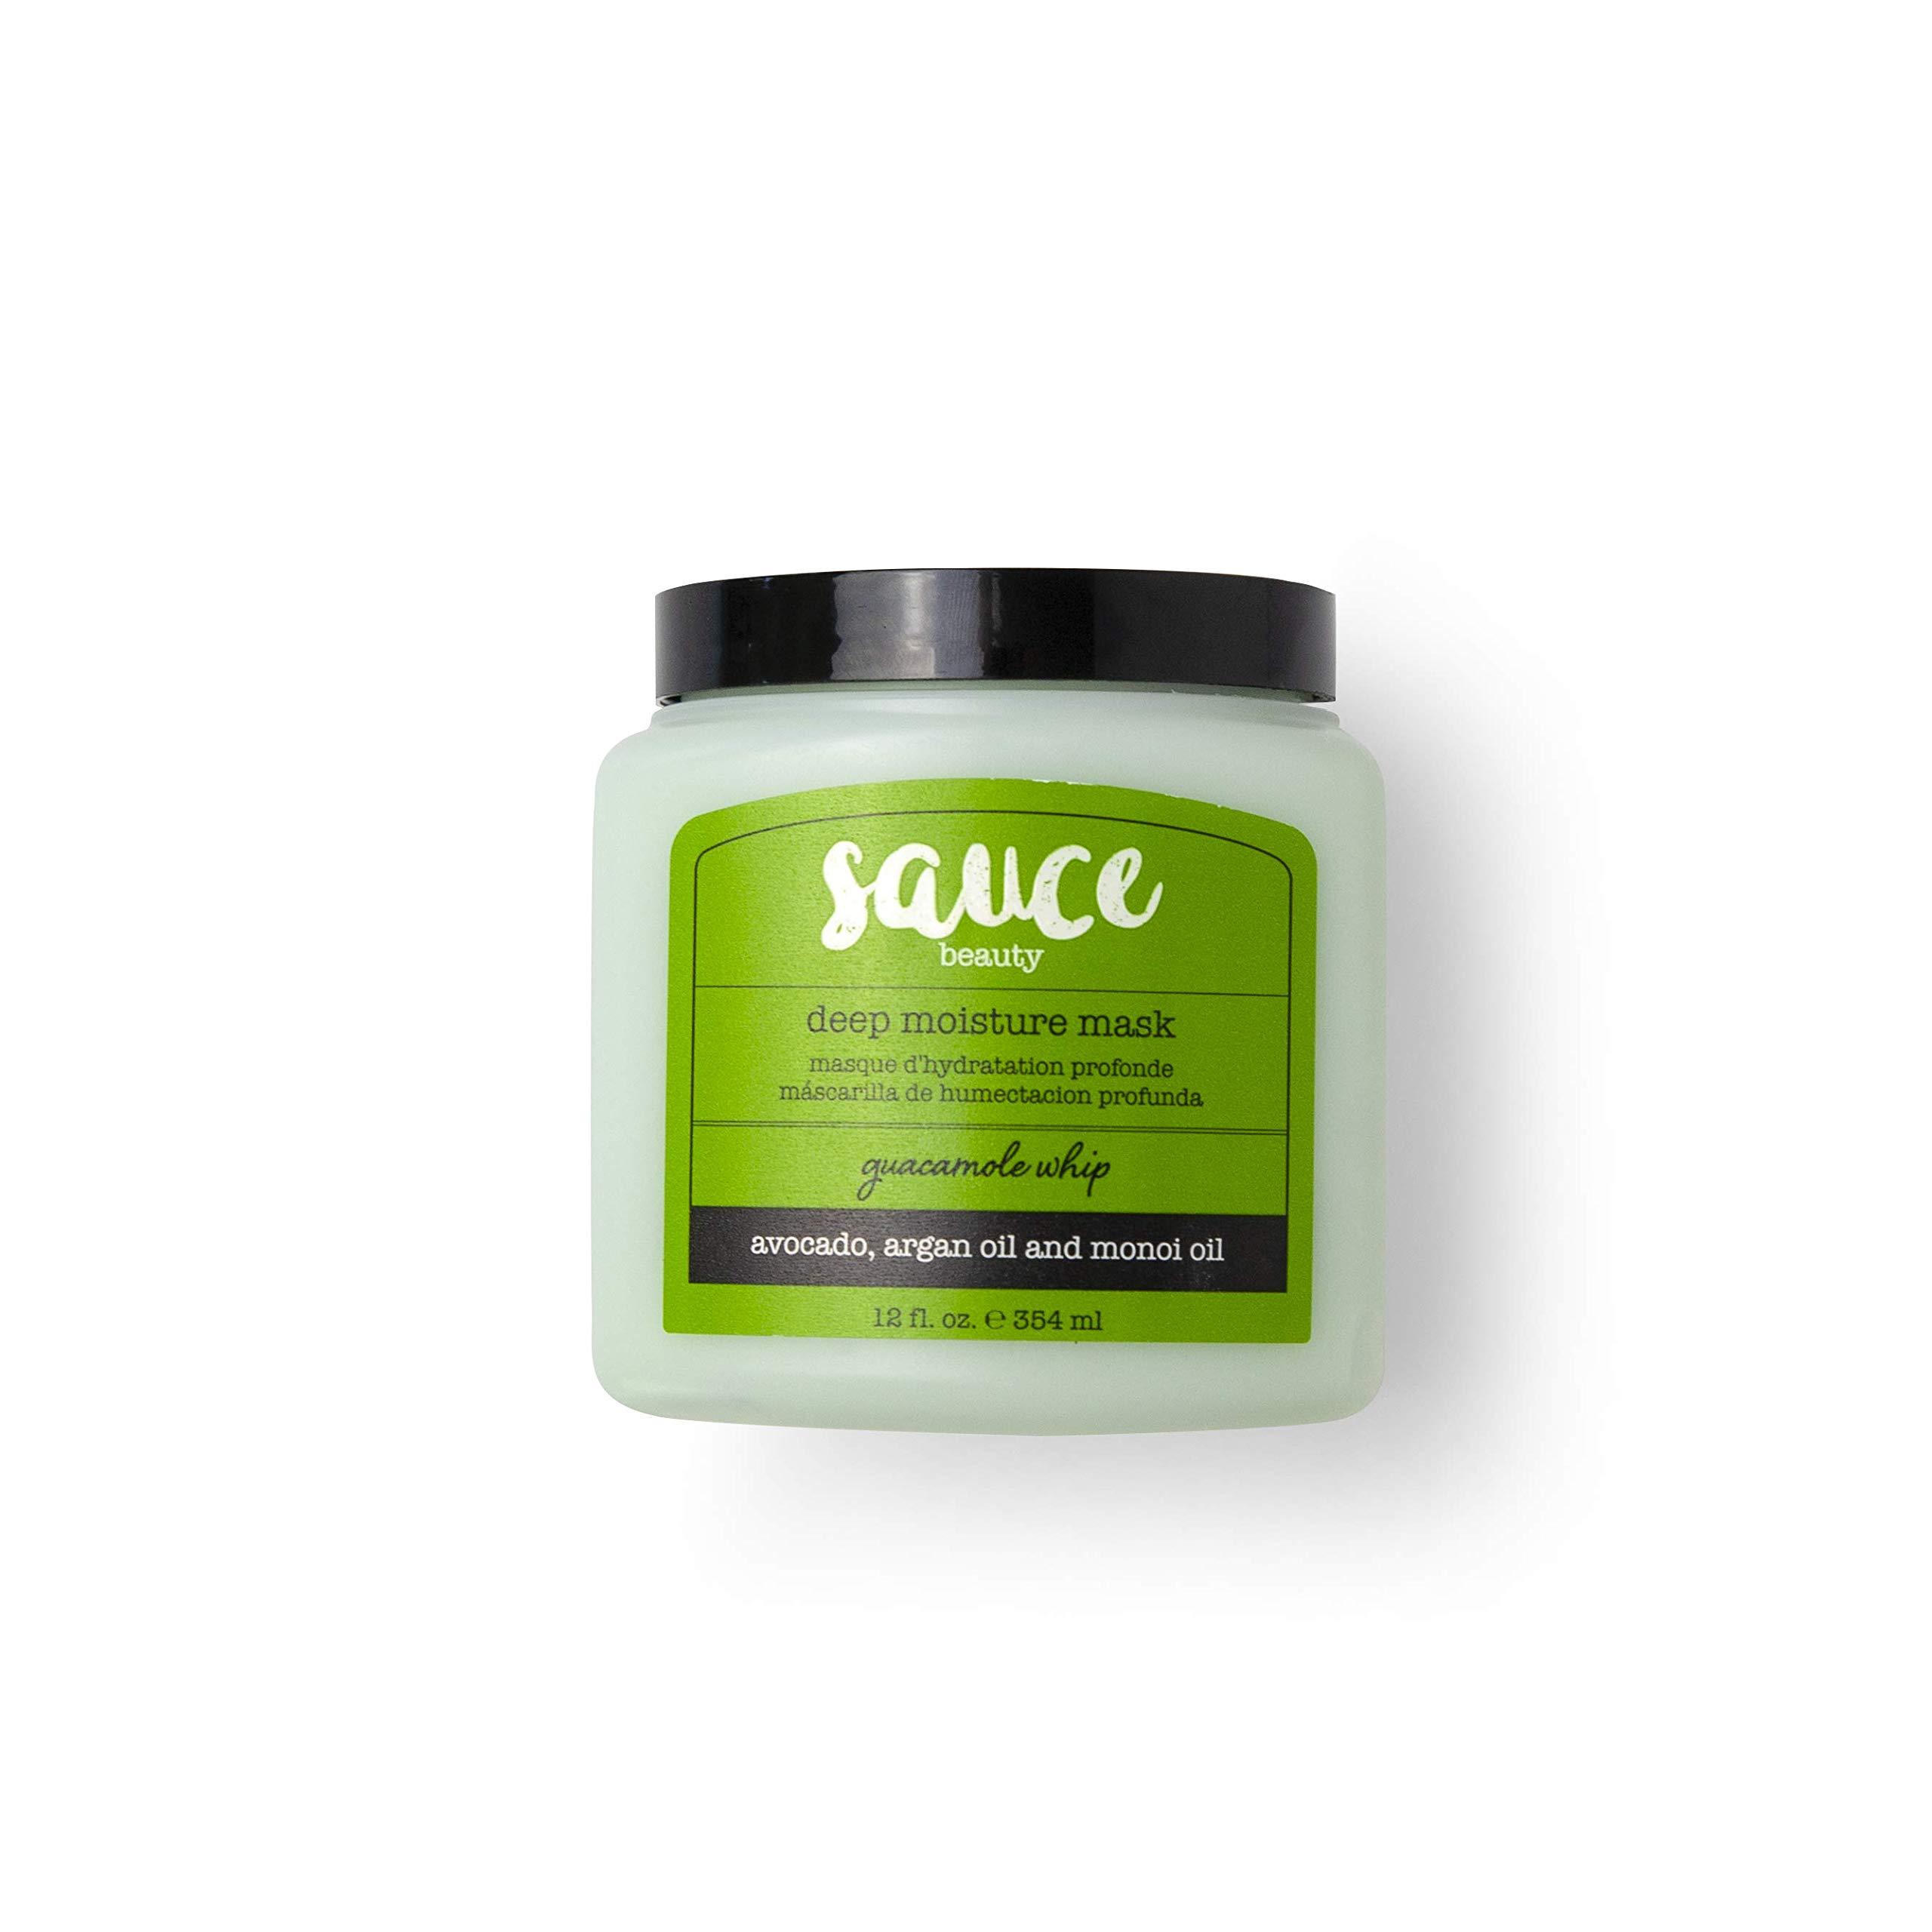 Hair Mask - Sauce Beauty Guacamole Whip Deep Moisture Mask Hair Treatment - Avocado, Jarrah Honey & Argan Oil. Deep Conditioning Hair Mask for Dry, Damaged Hair - Repair, Moisturize and Improve Shine